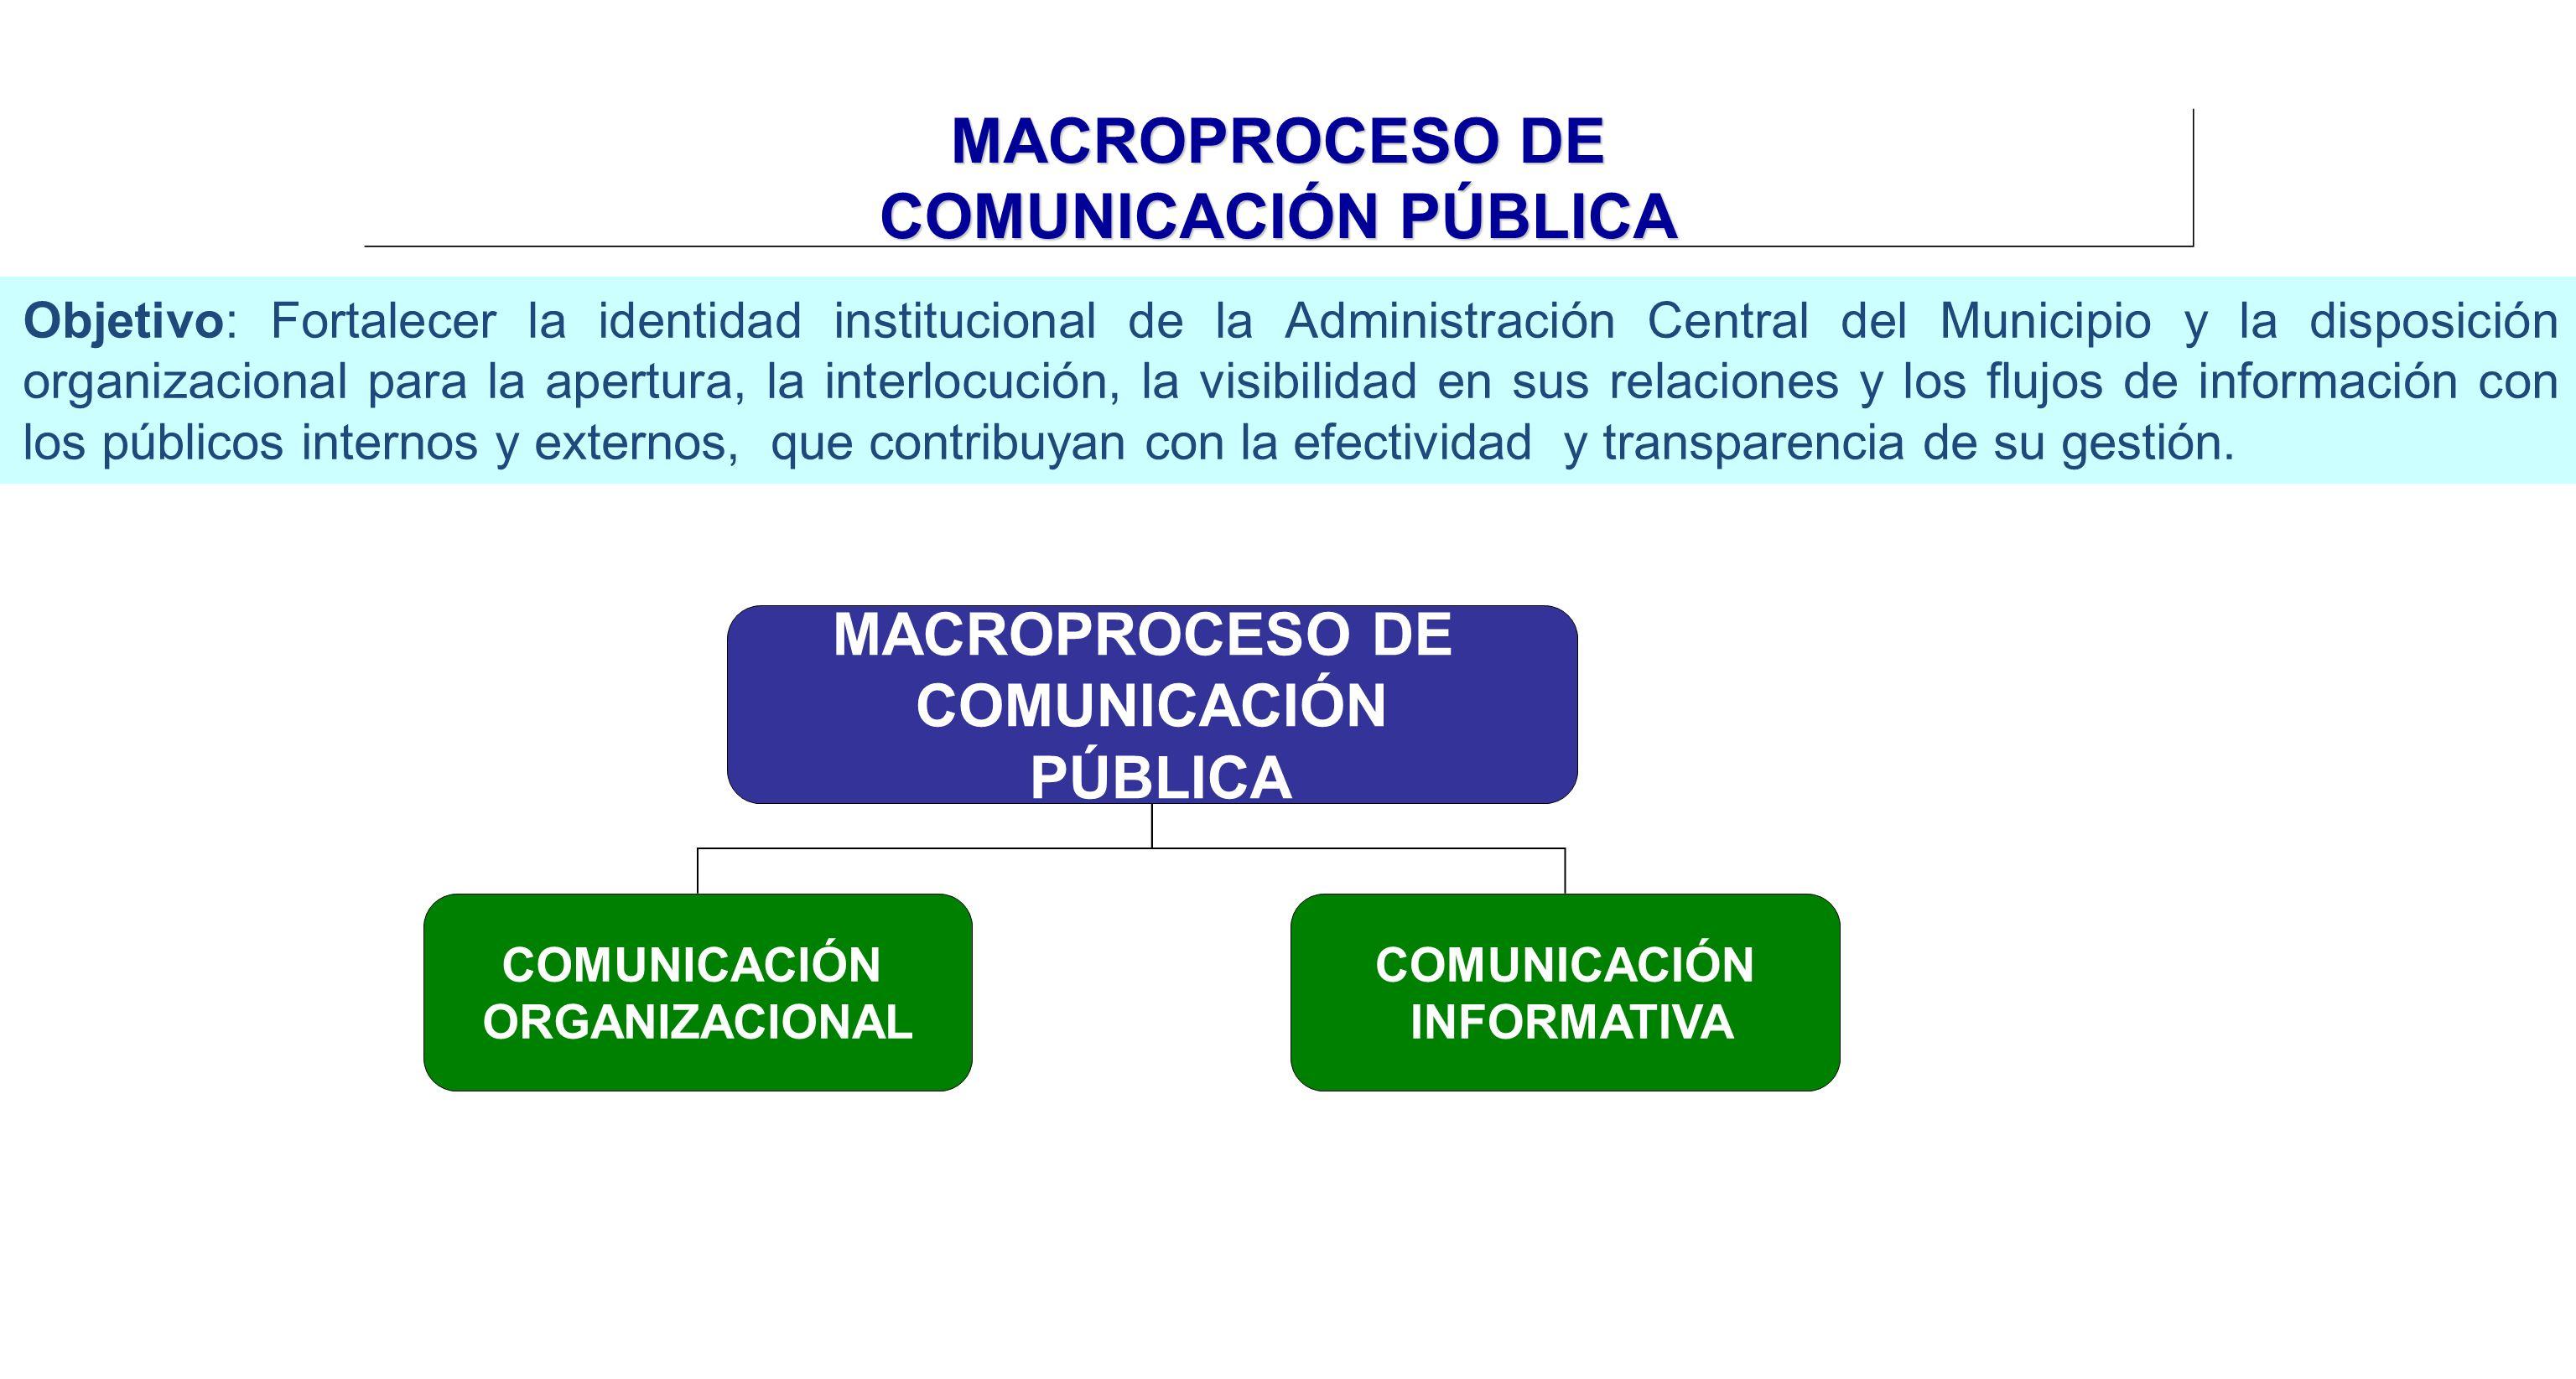 MACROPROCESO DE COMUNICACIÓN PÚBLICA COMUNICACIÓN INFORMATIVA COMUNICACIÓN ORGANIZACIONAL MACROPROCESO DE COMUNICACIÓN PÚBLICA Objetivo: Fortalecer la